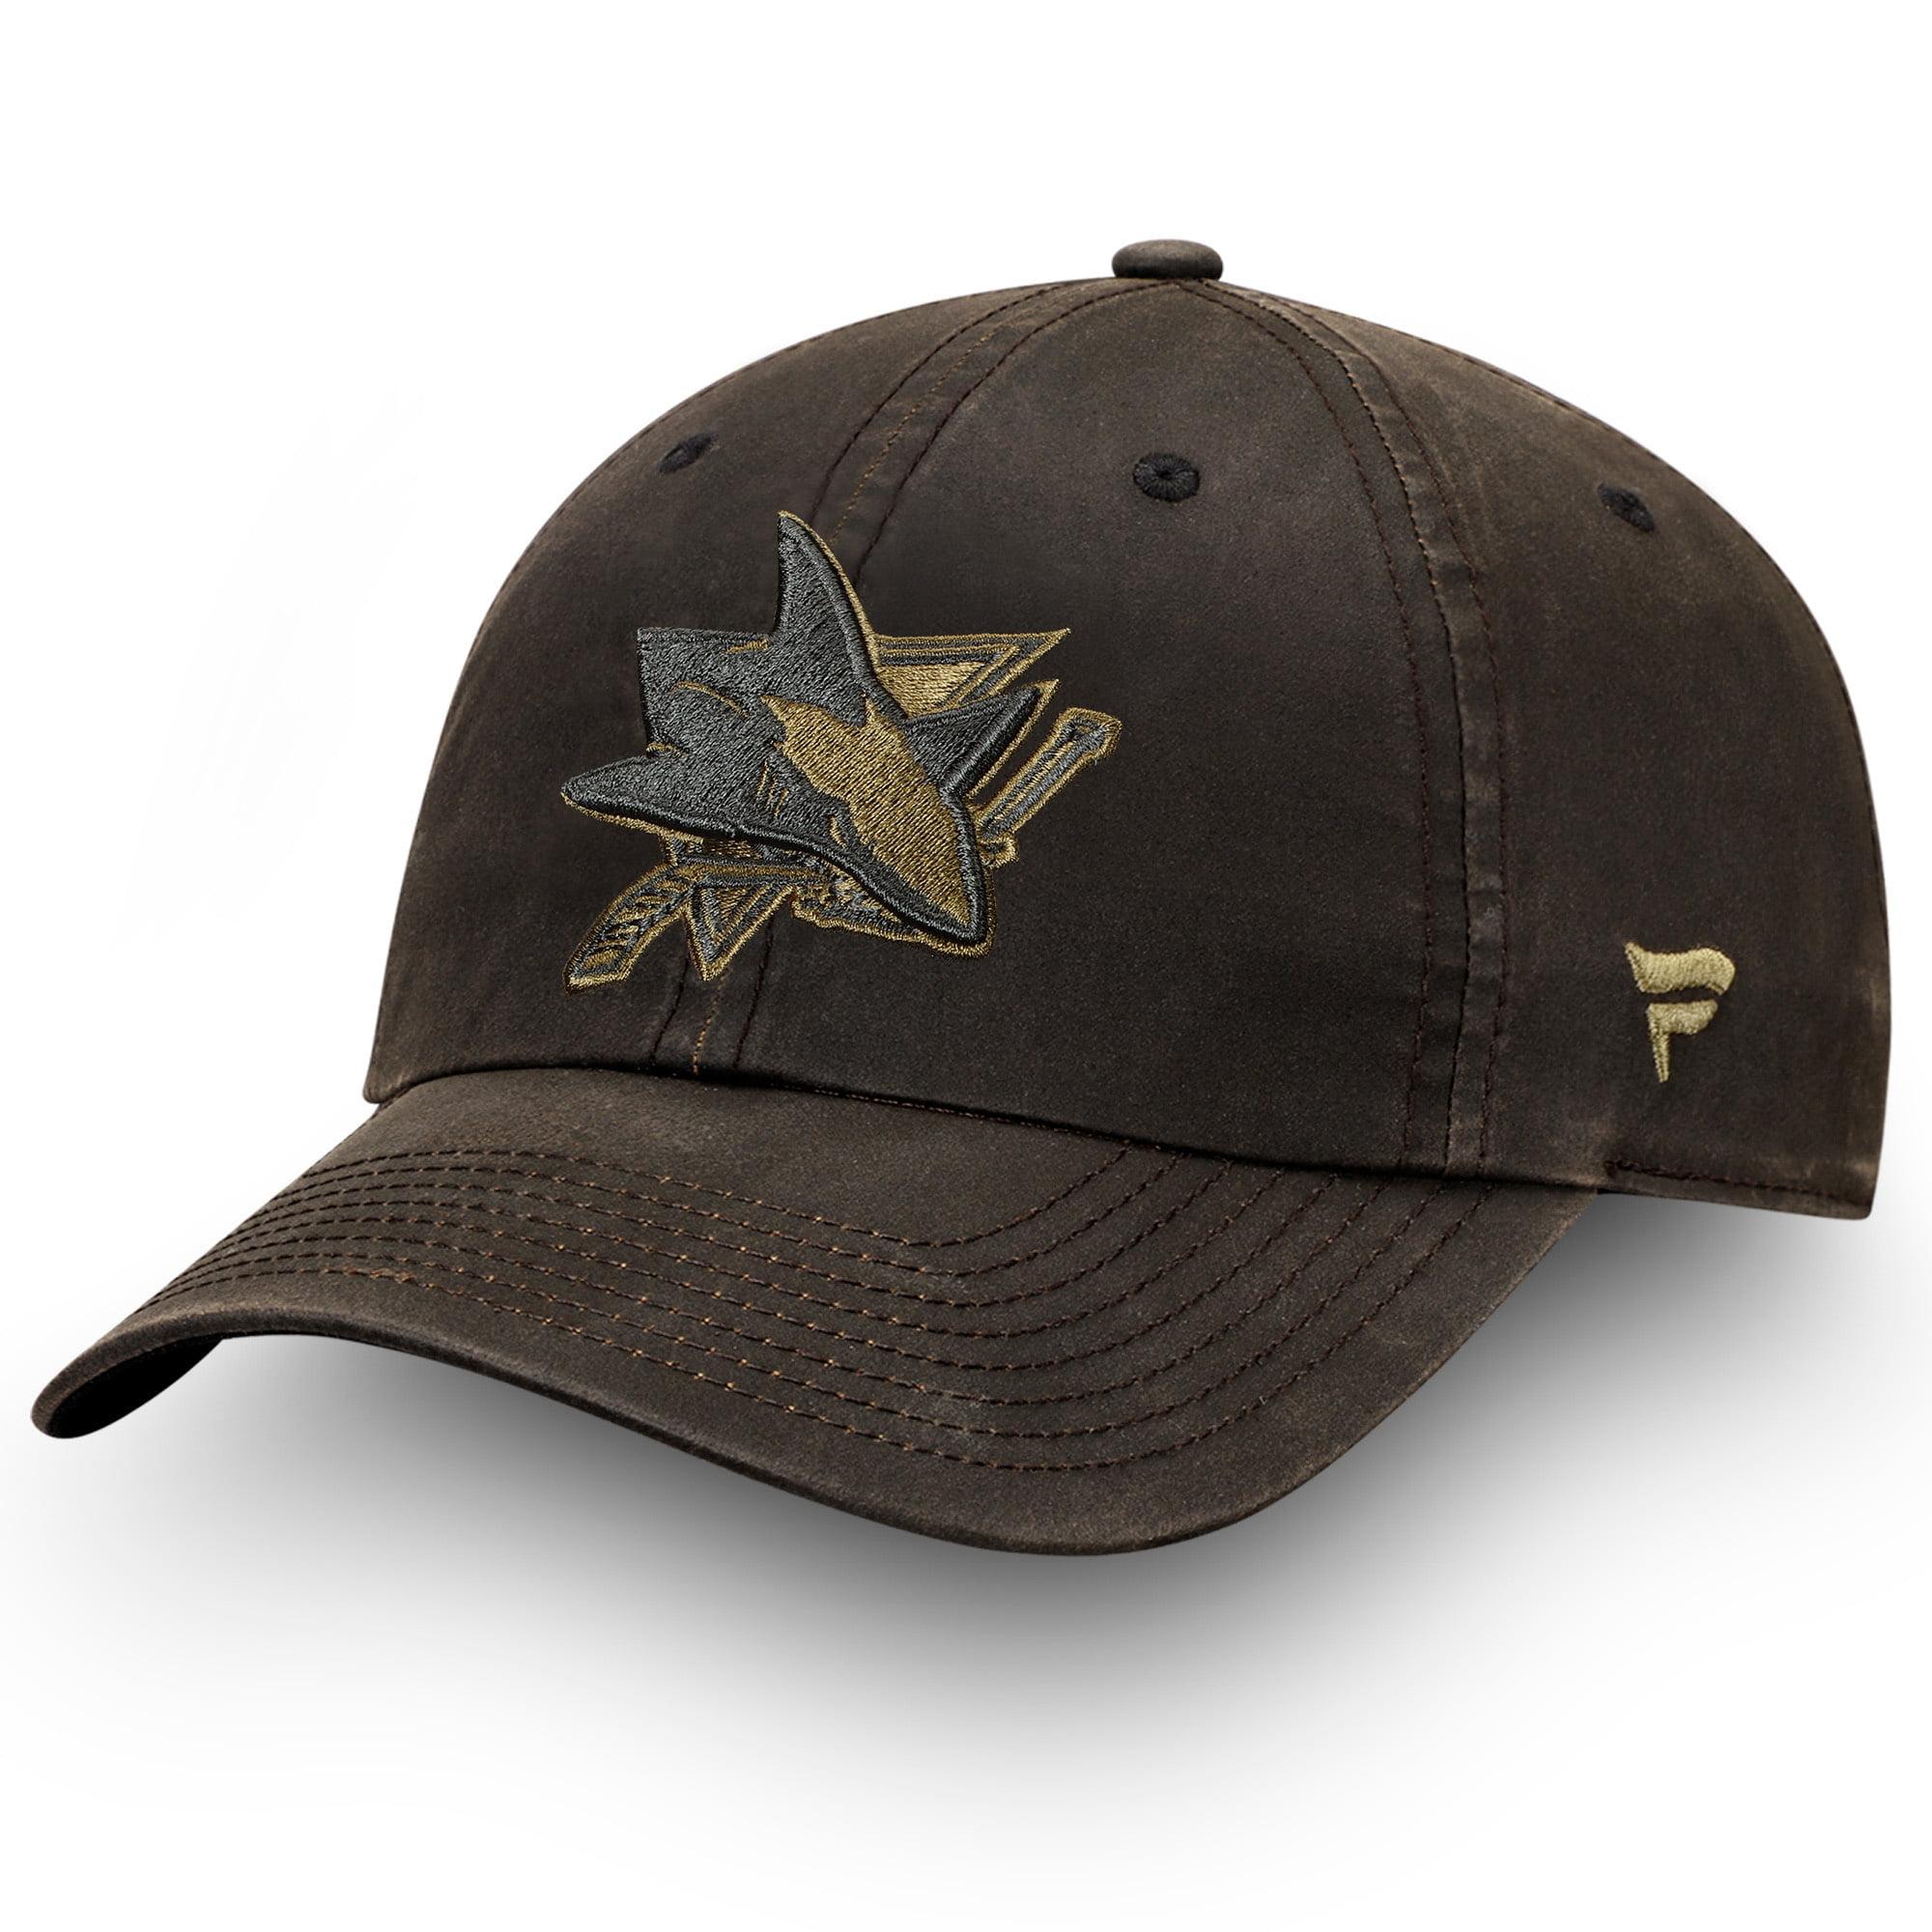 San Jose Sharks Fanatics Branded Lux Fundamental Adjustable Hat - Brown/Olive - OSFA